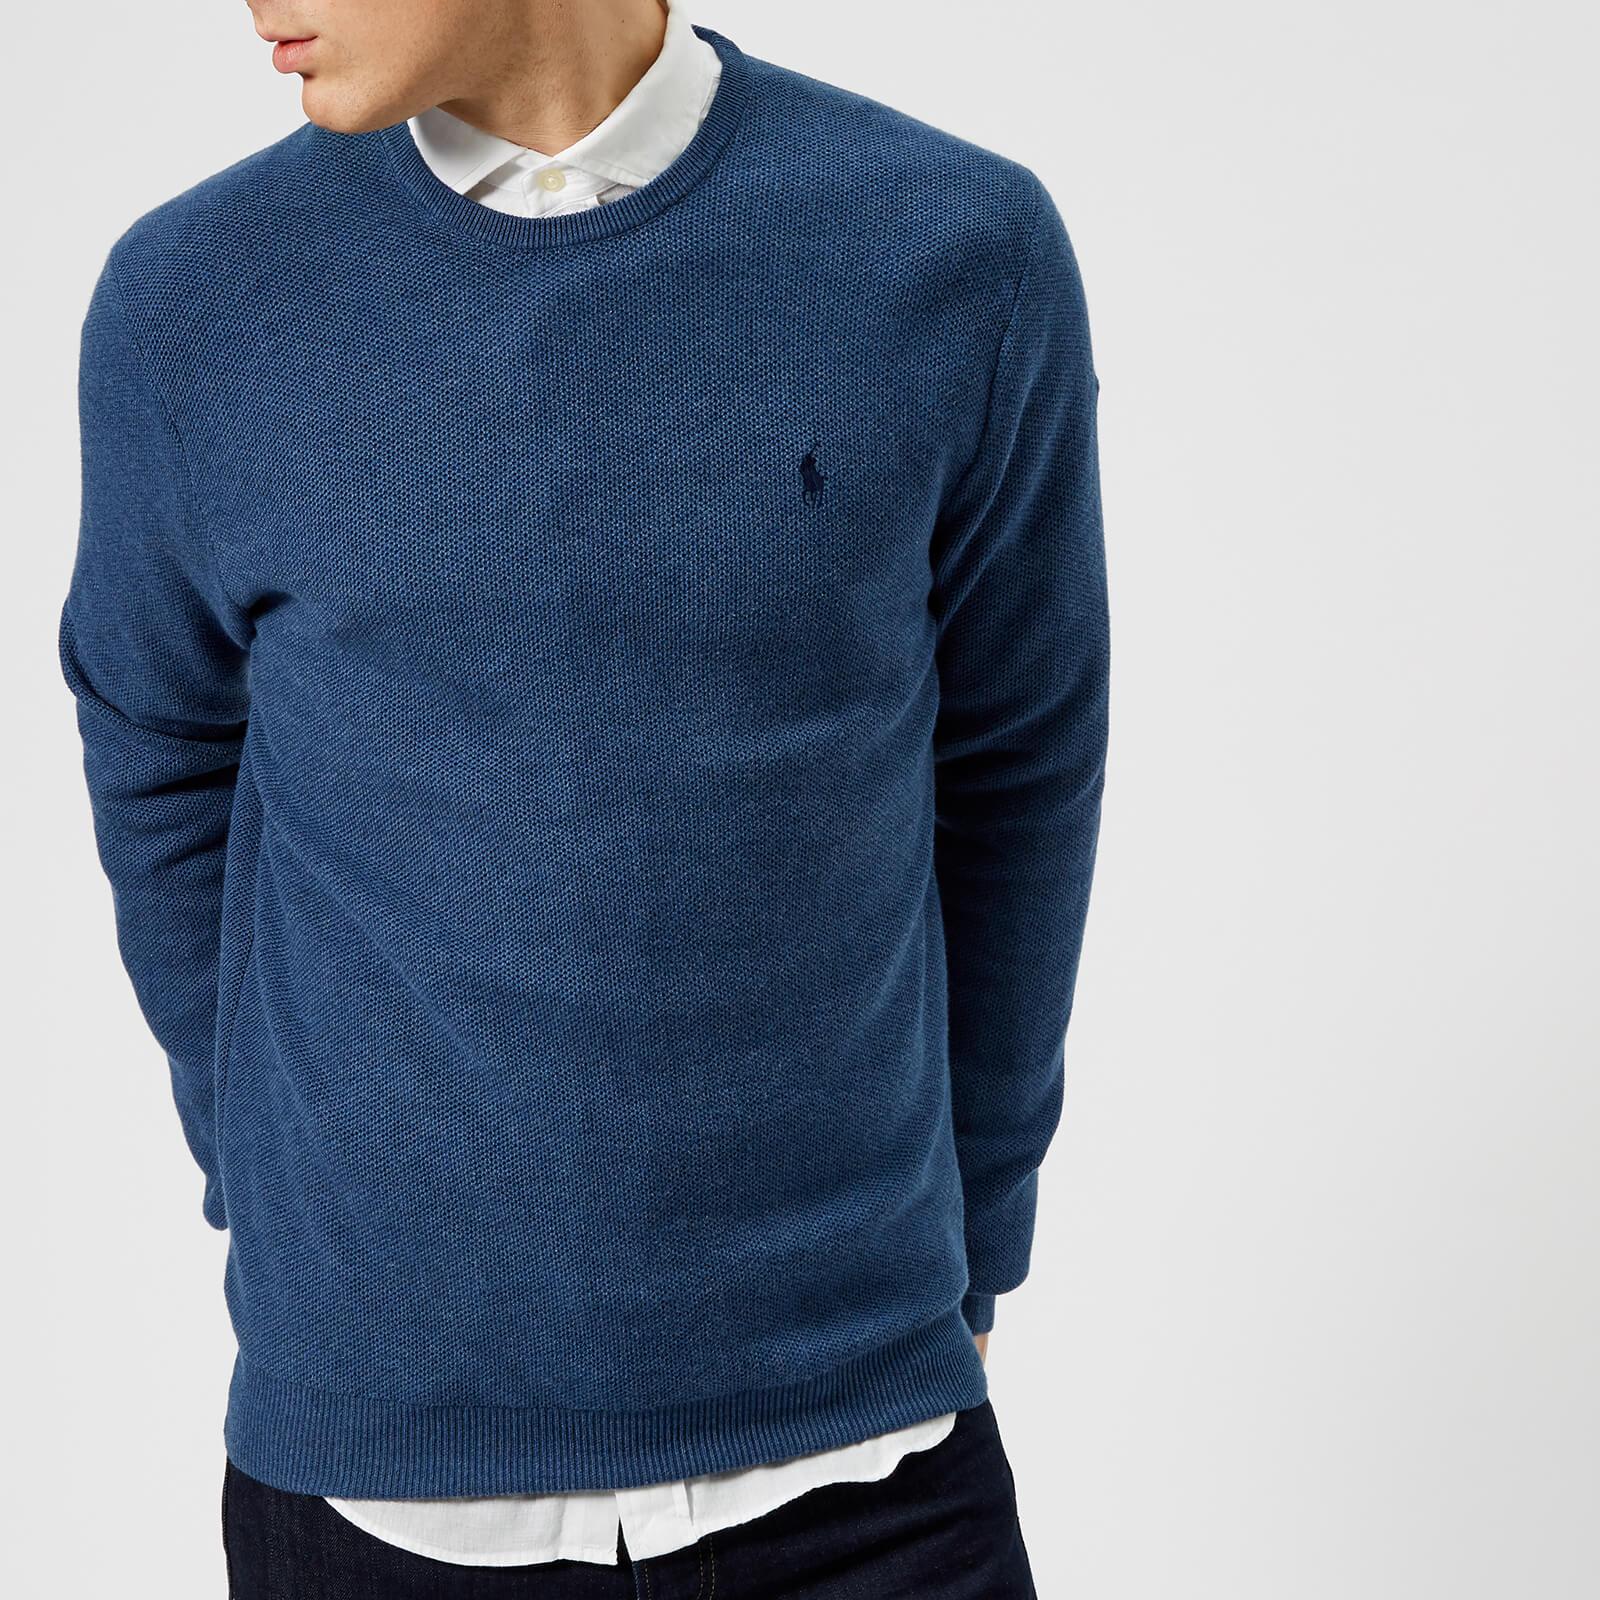 53a53c4cbf5fc Polo Ralph Lauren Men s Pima Cotton Crew Neck Sweater - Blue - Free UK  Delivery over £50